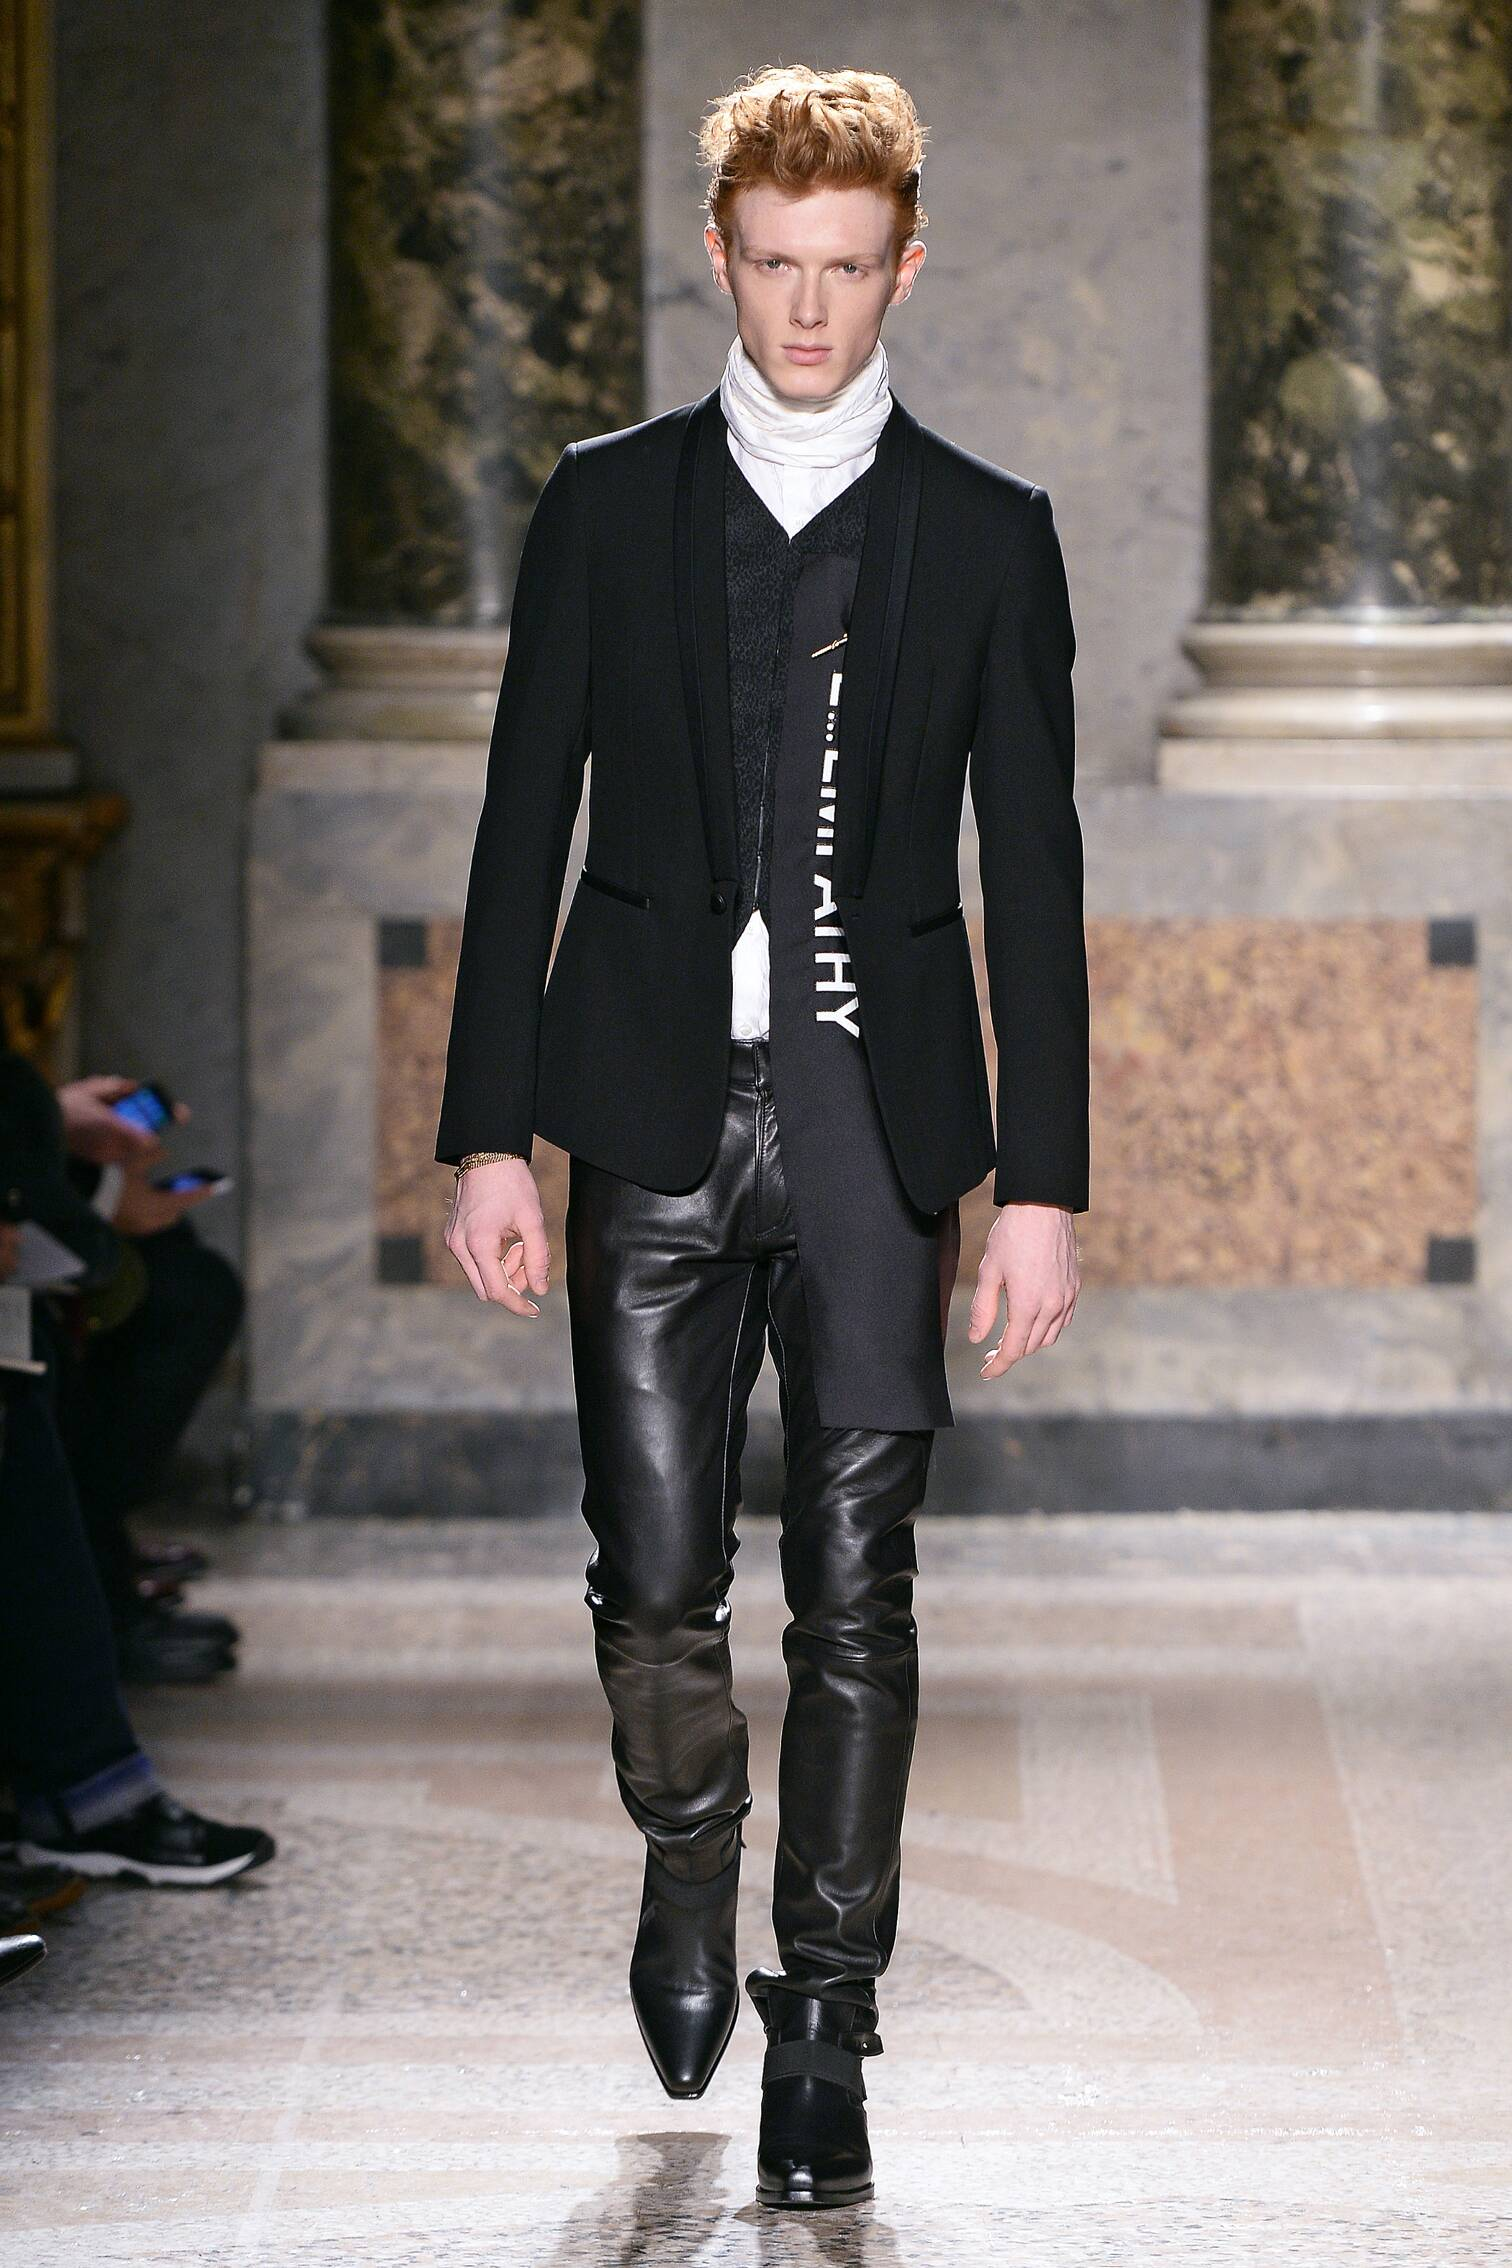 Roberto Cavalli Collection Winter 2015 Catwalk